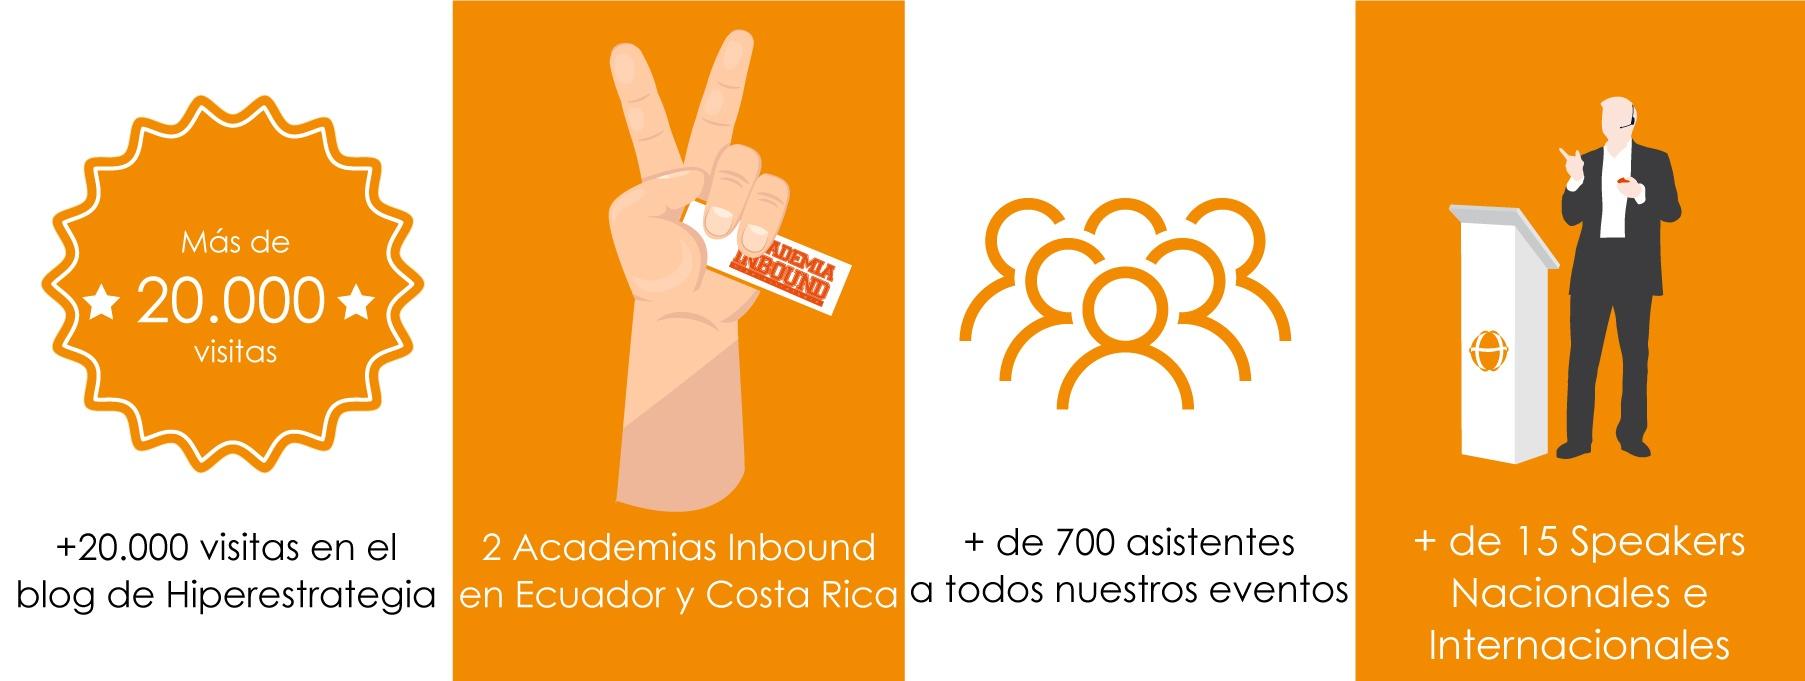 Agencia de Marketing Digital Ecuador